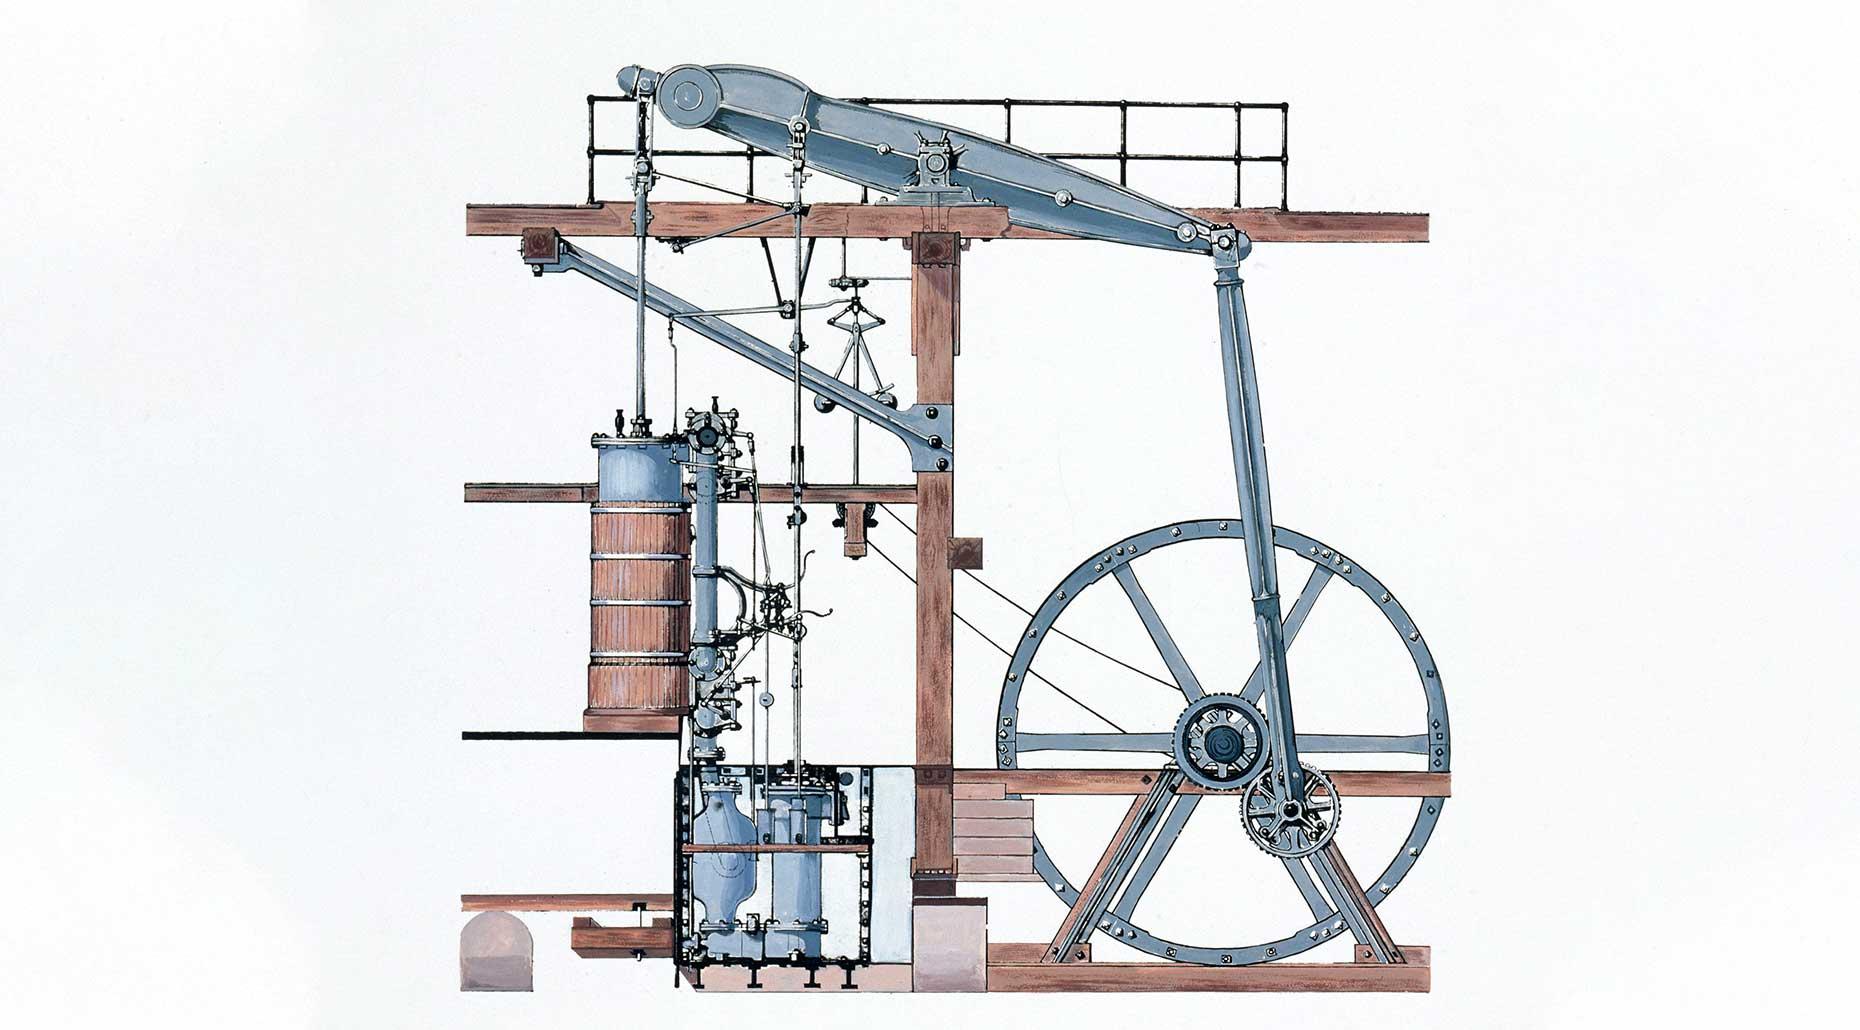 Boulton and Watt rotative steam engine, 1785, manufactured by Matthew Boulton and James Watt, England. Powerhouse Collection.